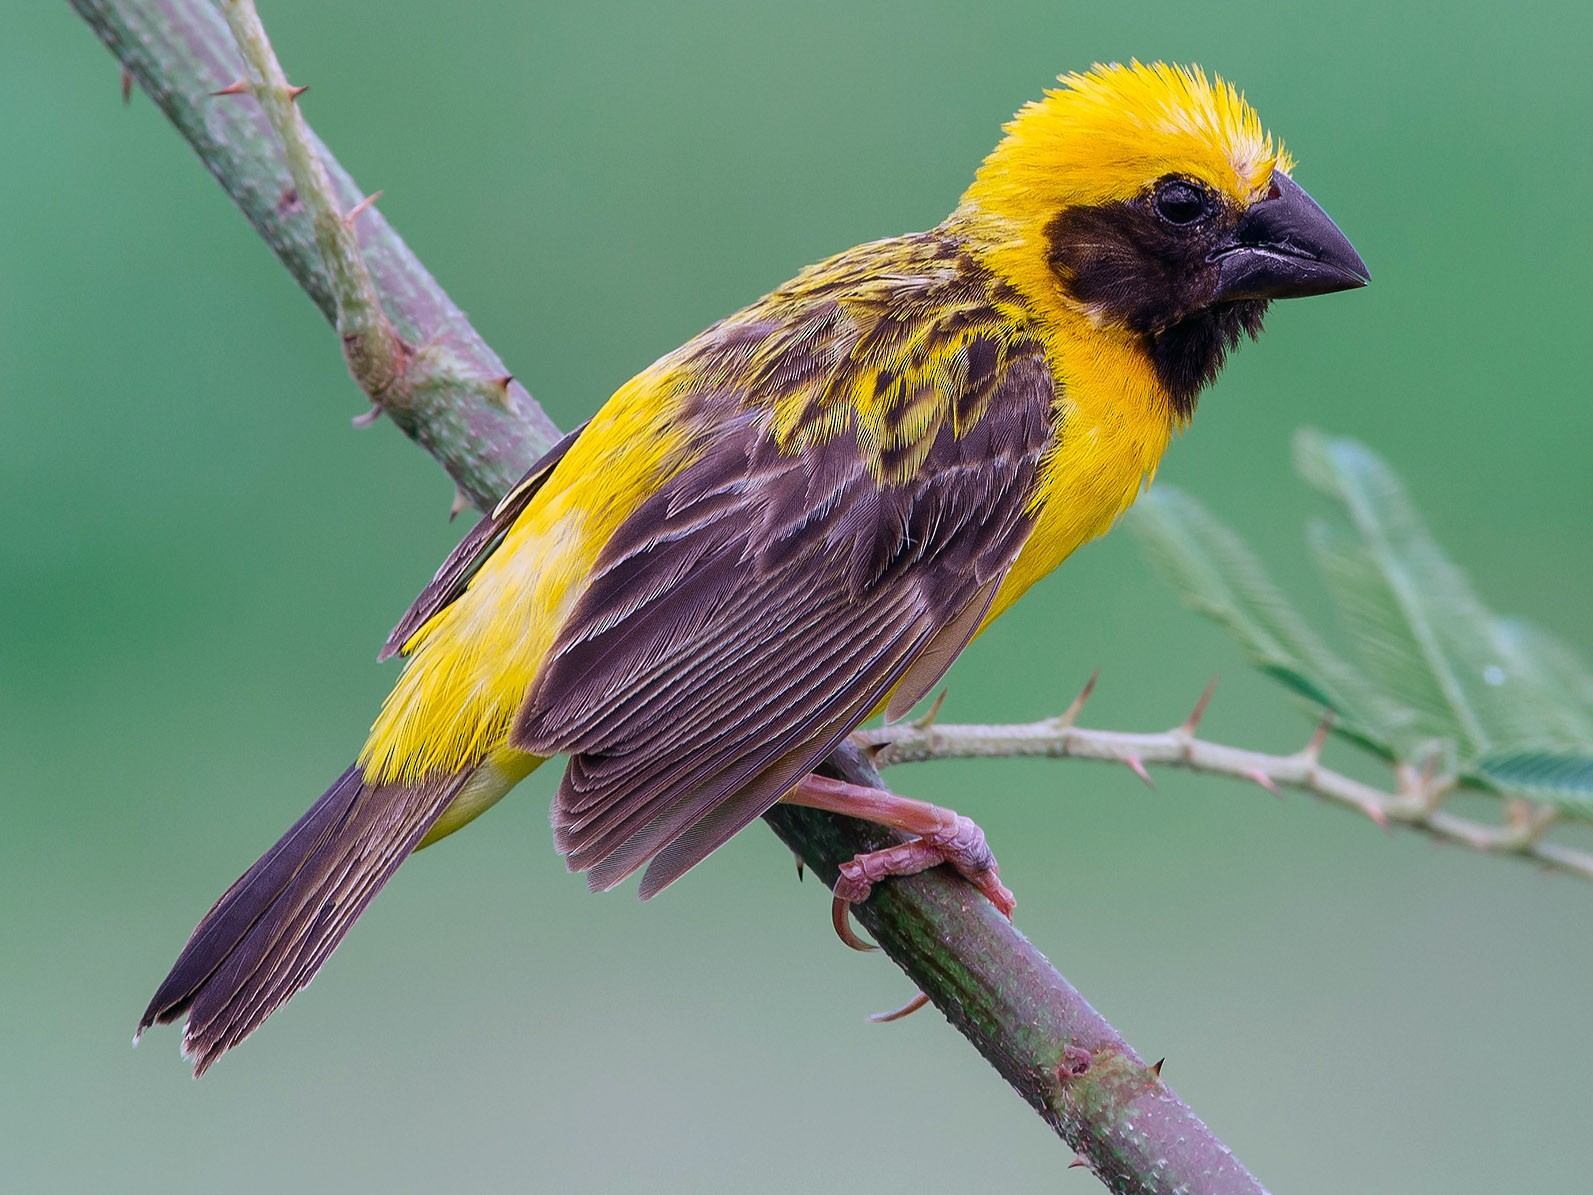 Asian Golden Weaver - Natthaphat Chotjuckdikul